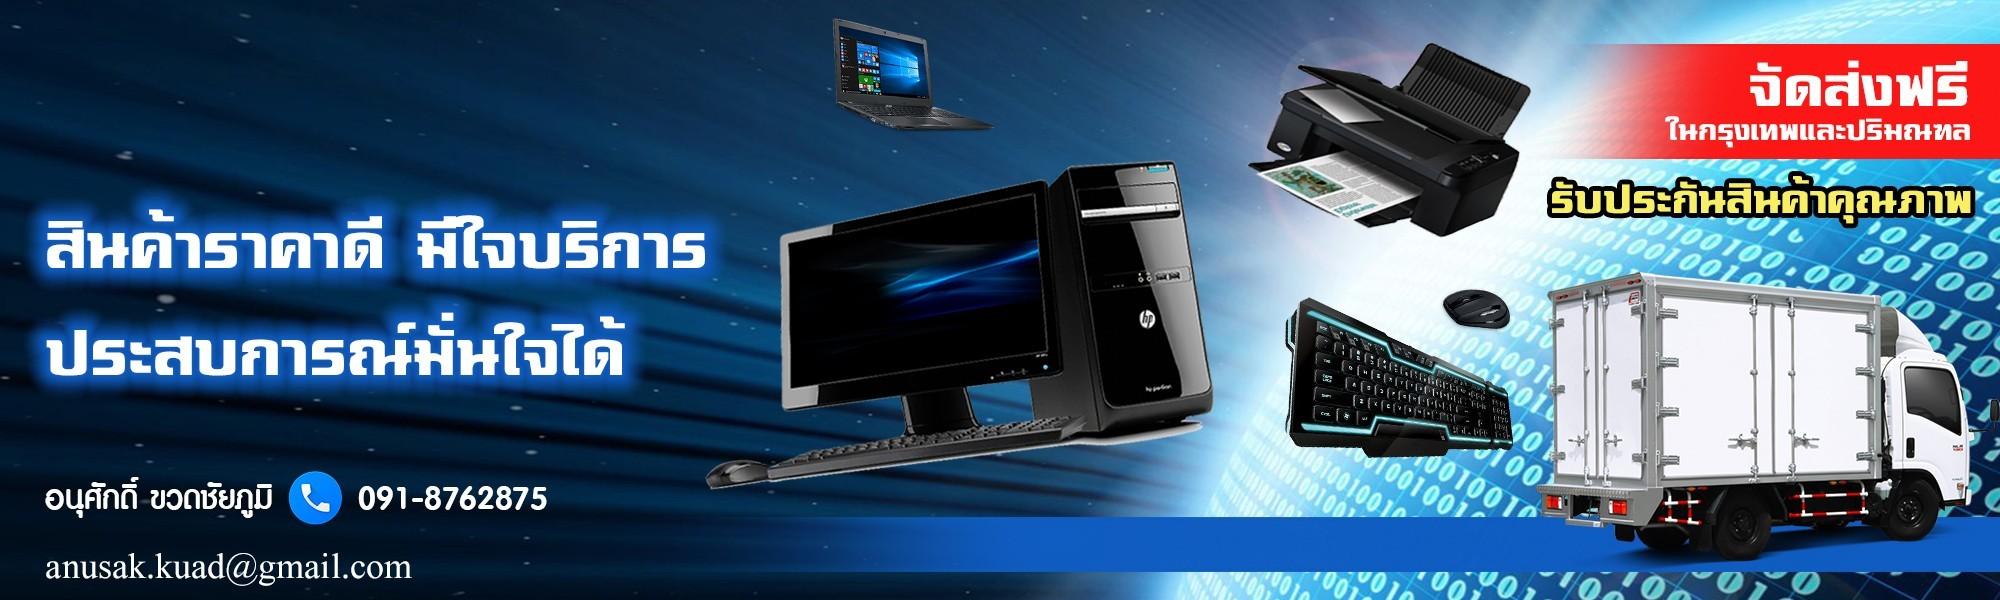 Iget Smart Lenovo Ideacentre Aio 510 22ish Core I5 7100t 4gb Ddr4 1tb Hd White New Notebook